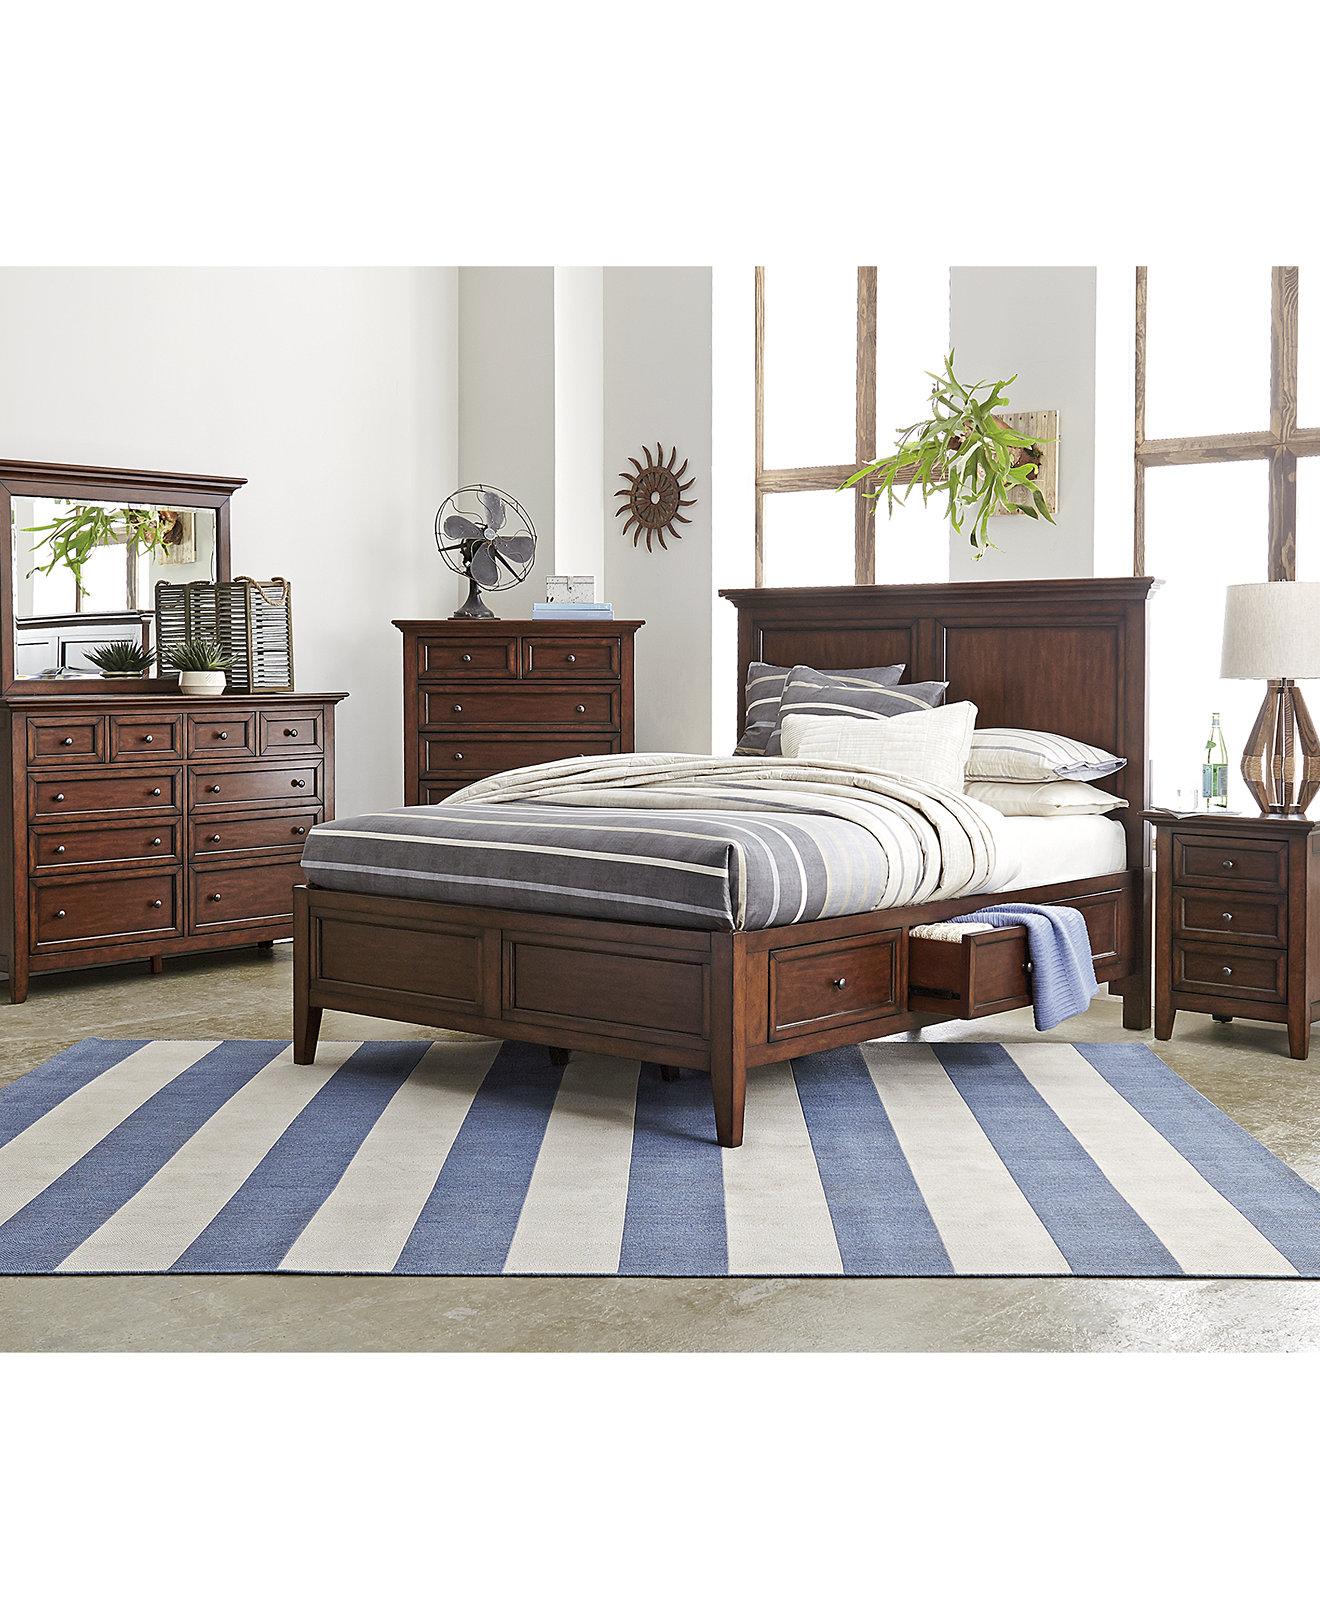 Macys Bedroom Furniture Bedroom Furniture Sets Macys